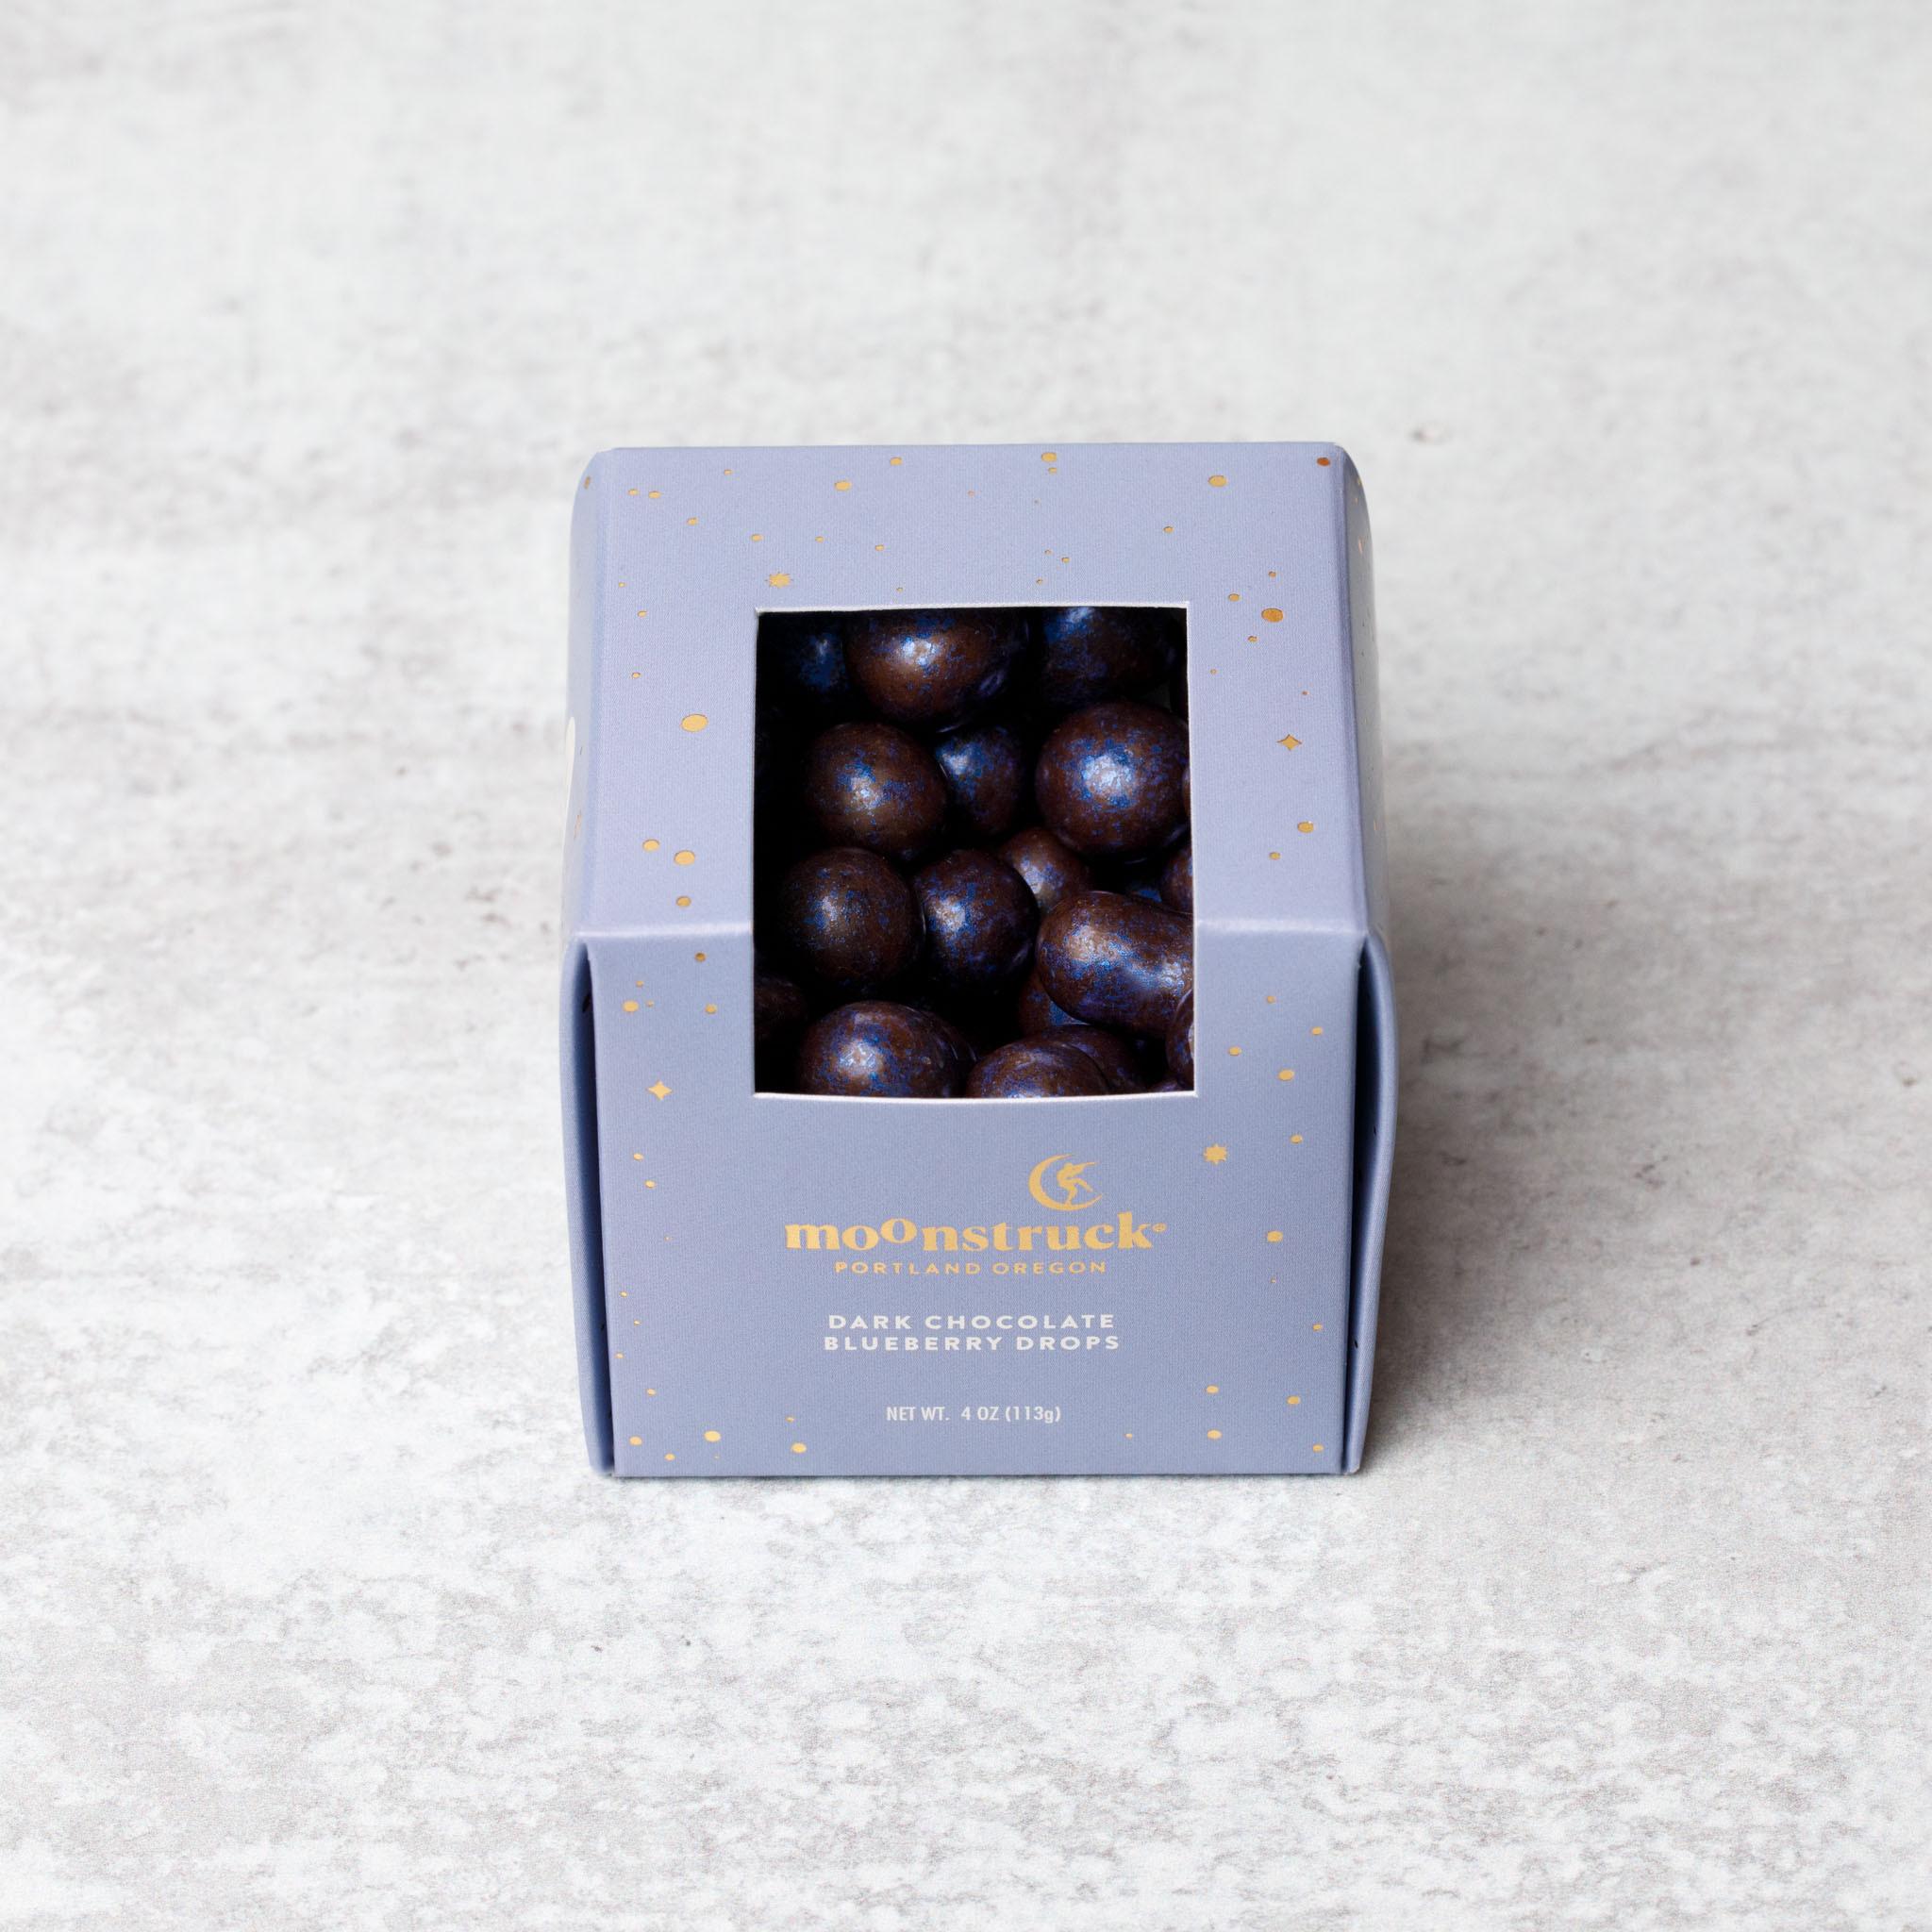 Dark Chocolate Blueberry Drops